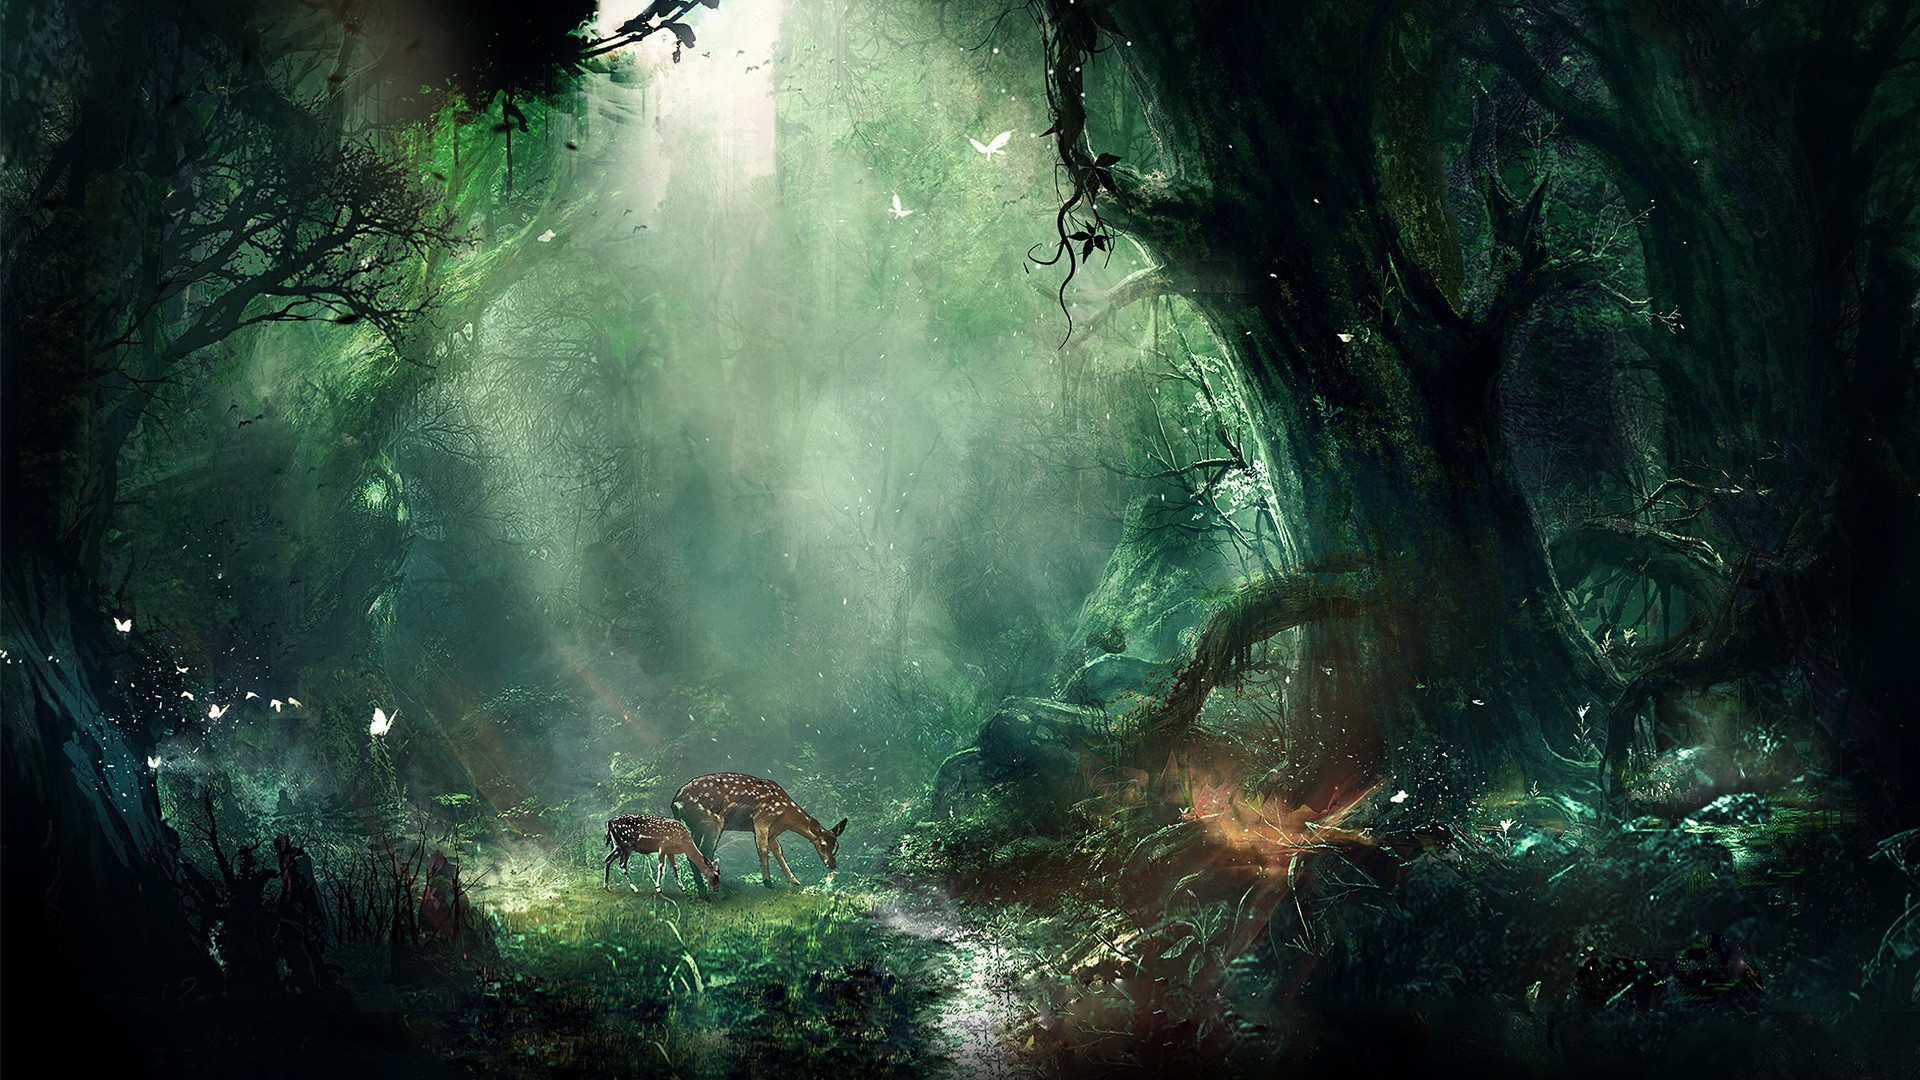 Full Hd 1080p Fantasy Wallpapers Desktop Backgrounds Hd Pictures Src